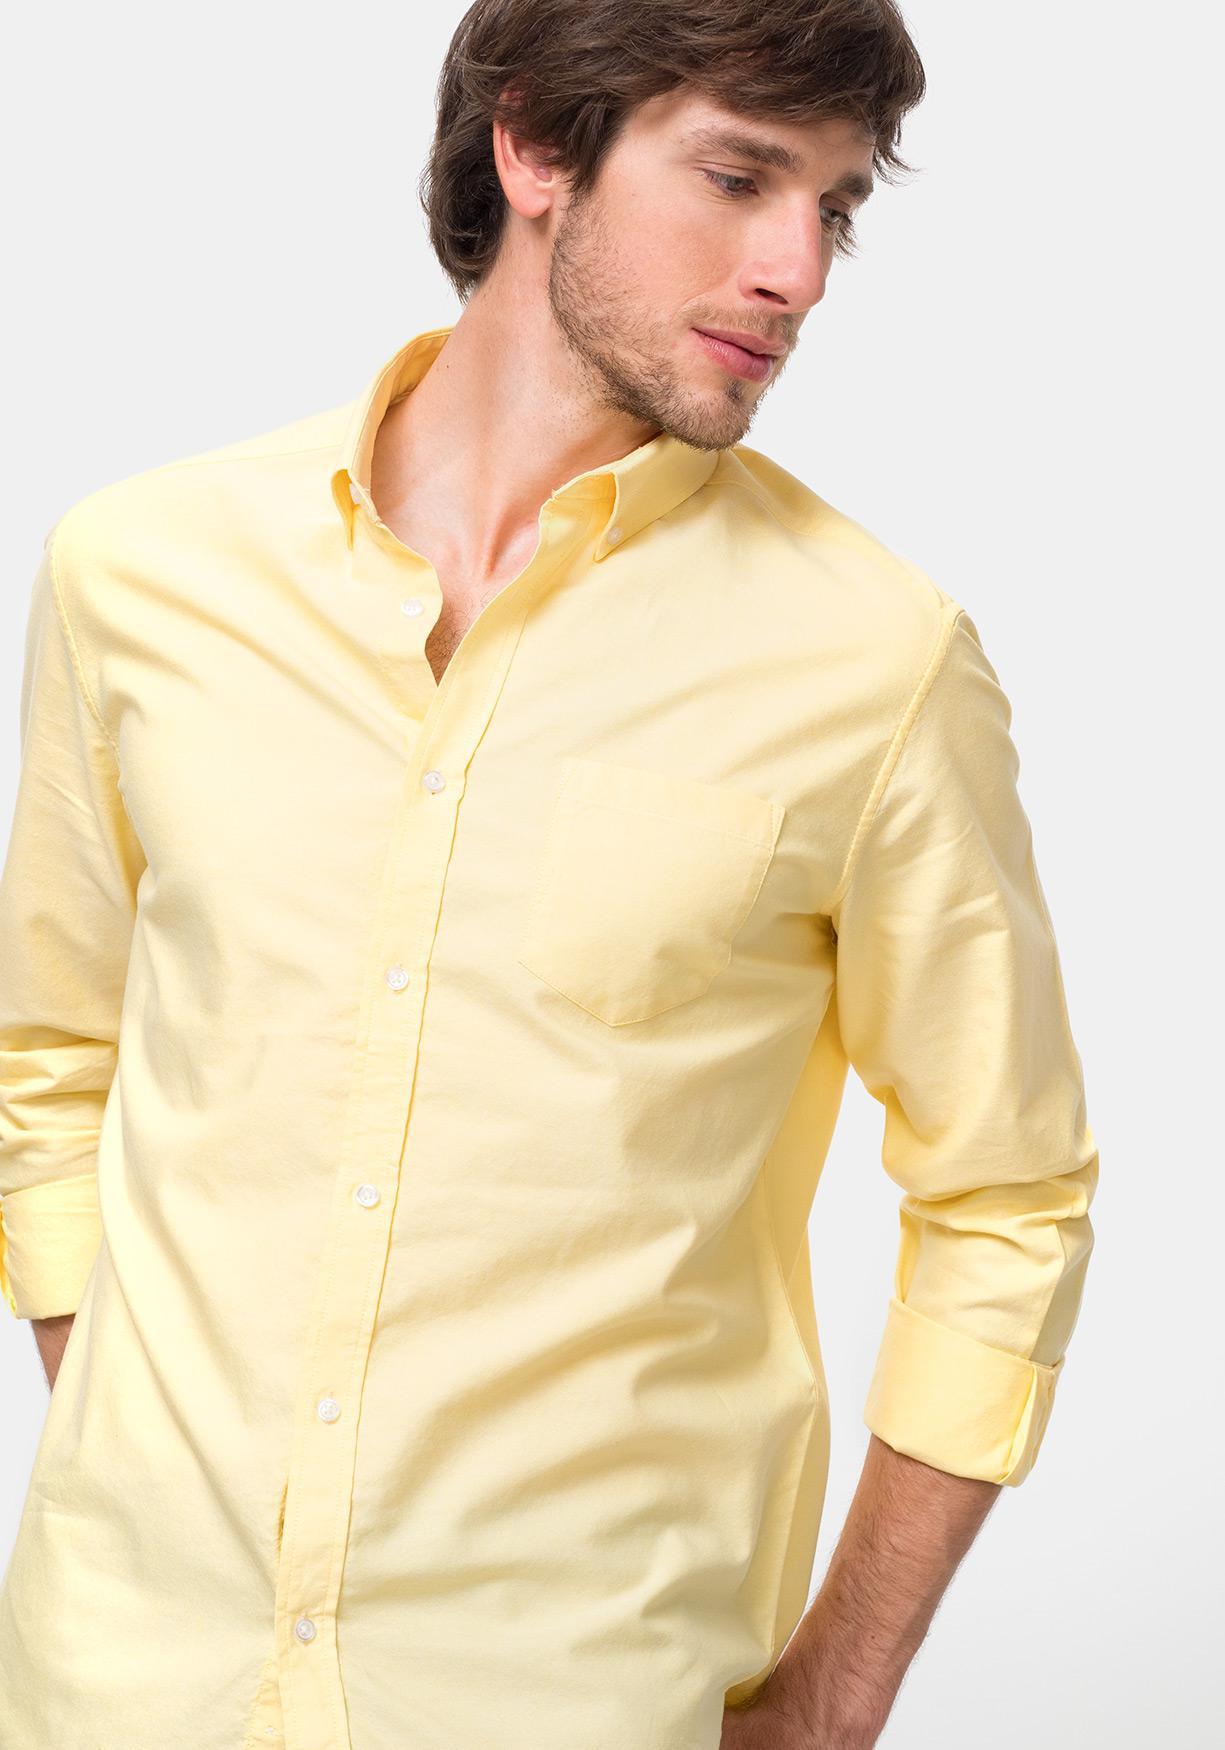 bdbd5d1a6e3a1 Comprar Camisa con bolsillo manga larga TEX. ¡Aprovéchate de ...